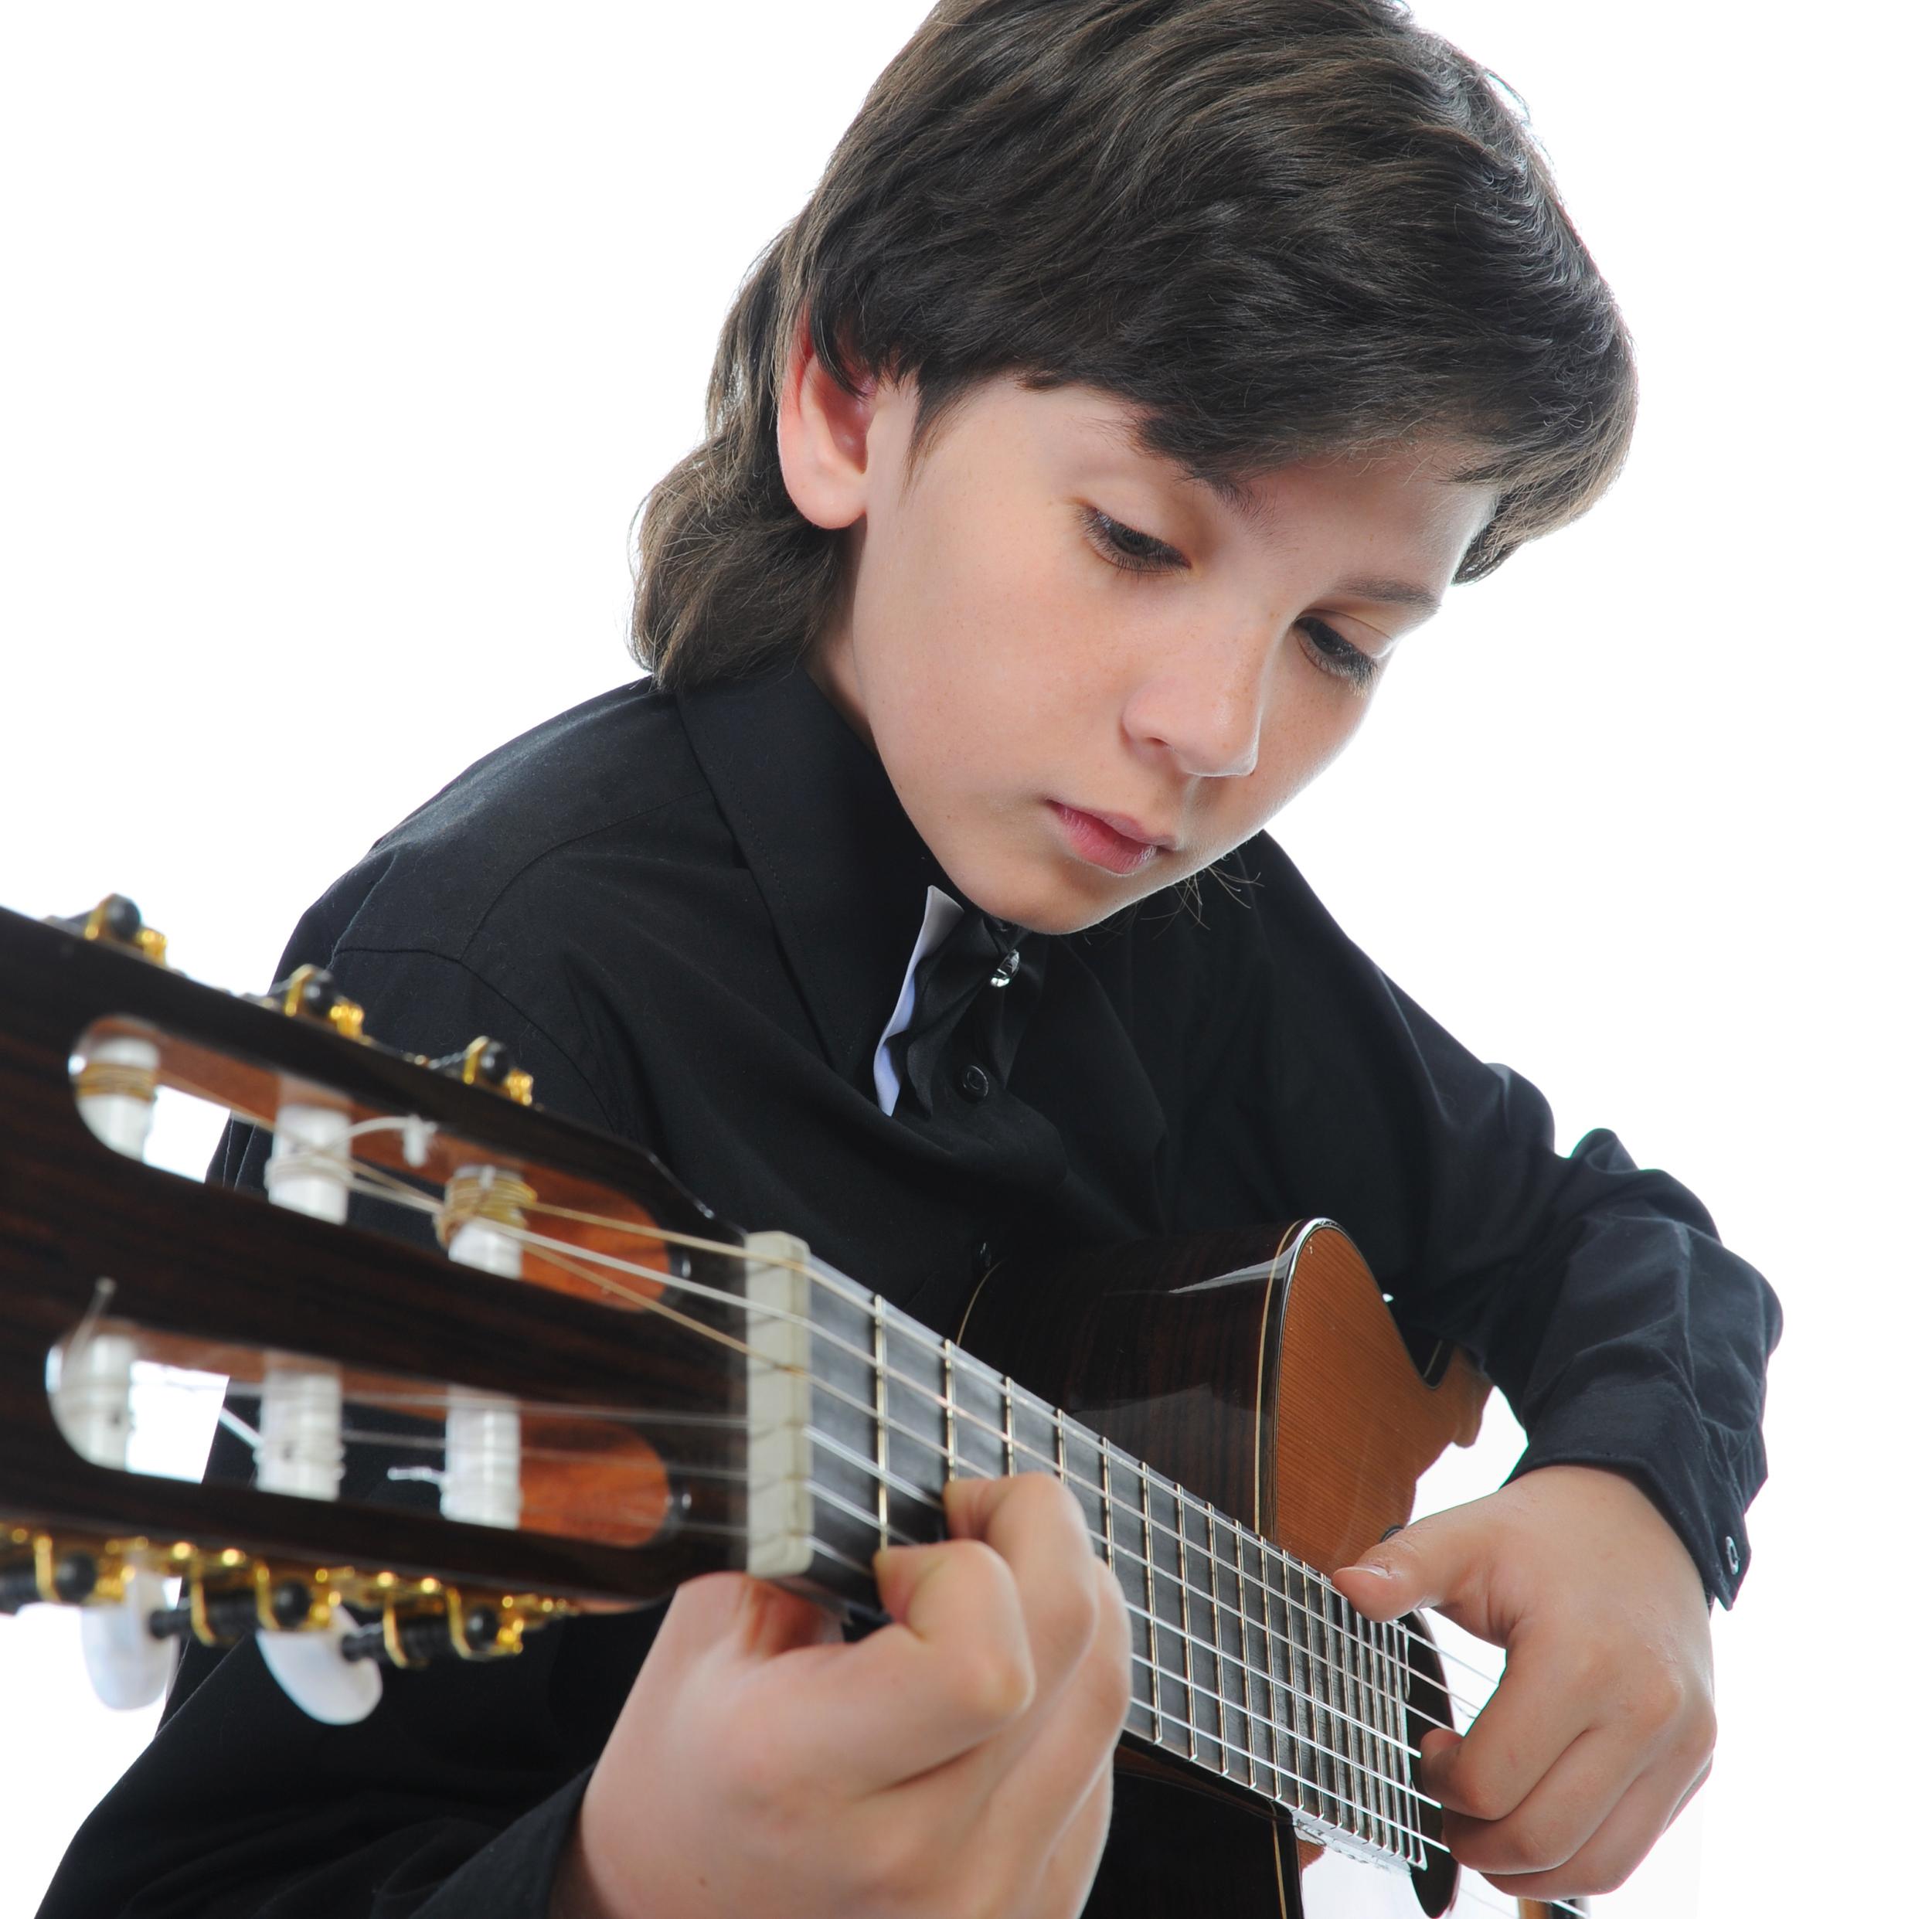 shutterstock-kid2.jpg